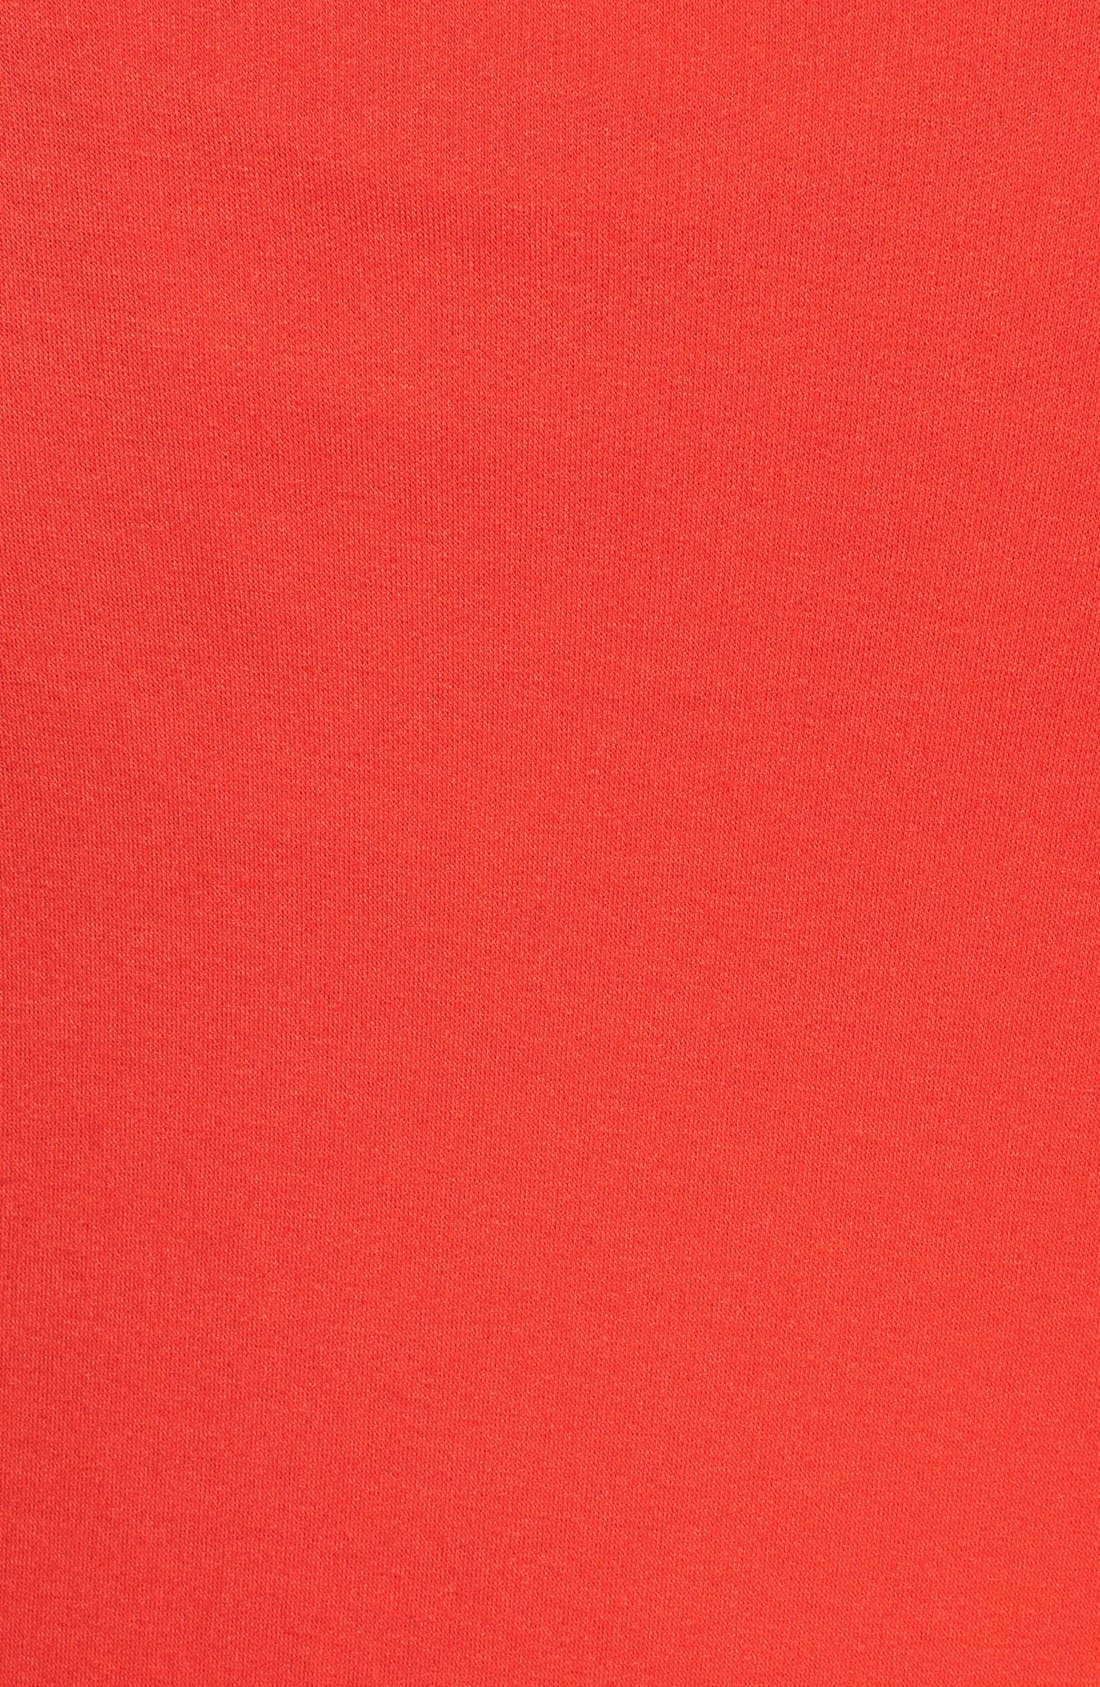 ,                             One-Button Fleece Wrap Cardigan,                             Alternate thumbnail 229, color,                             806